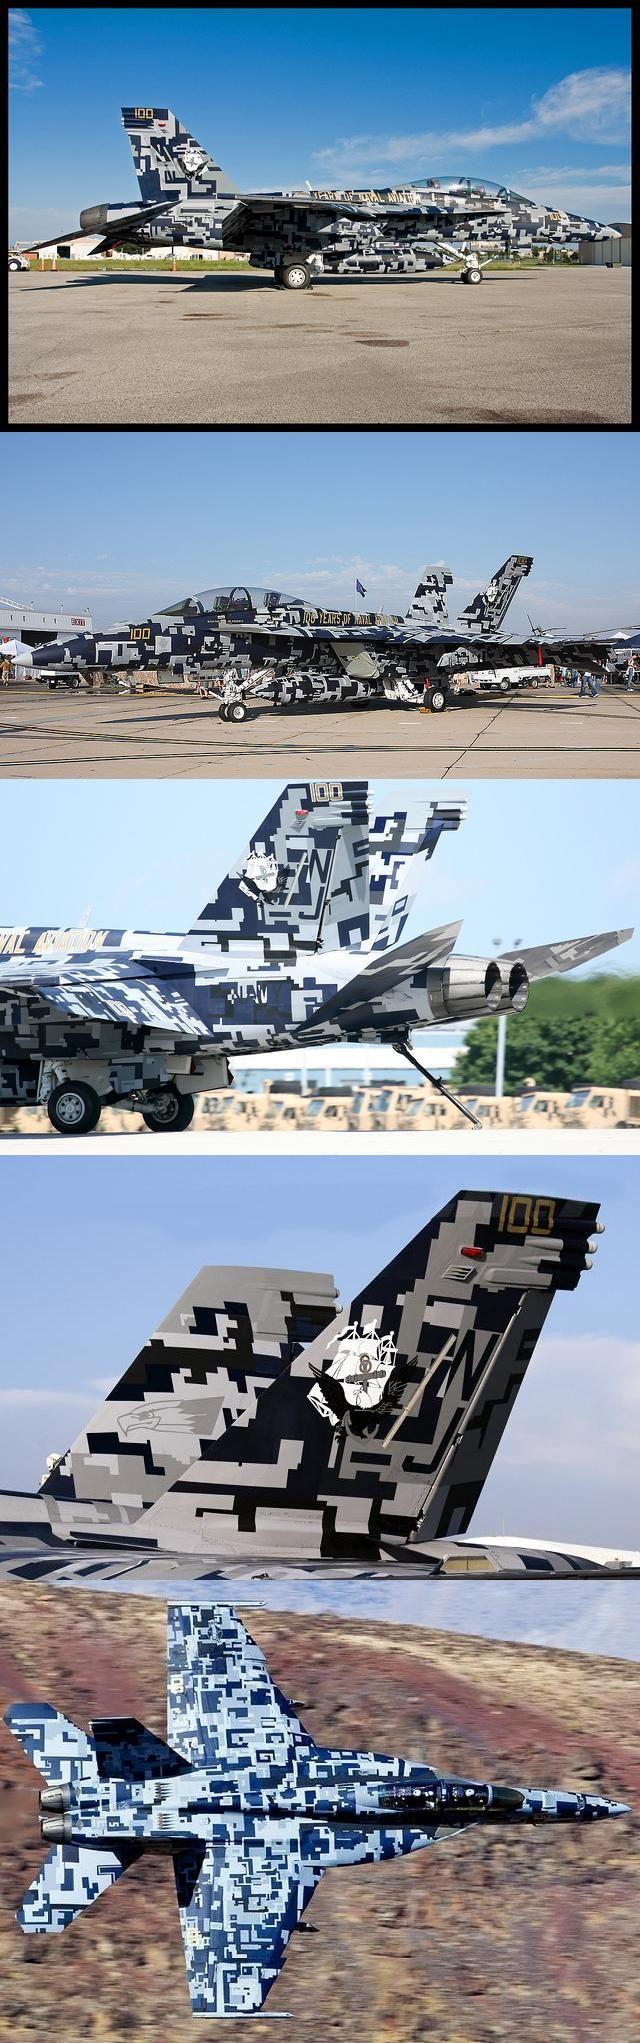 F/A-18F Super Hornet squadron VFA-122